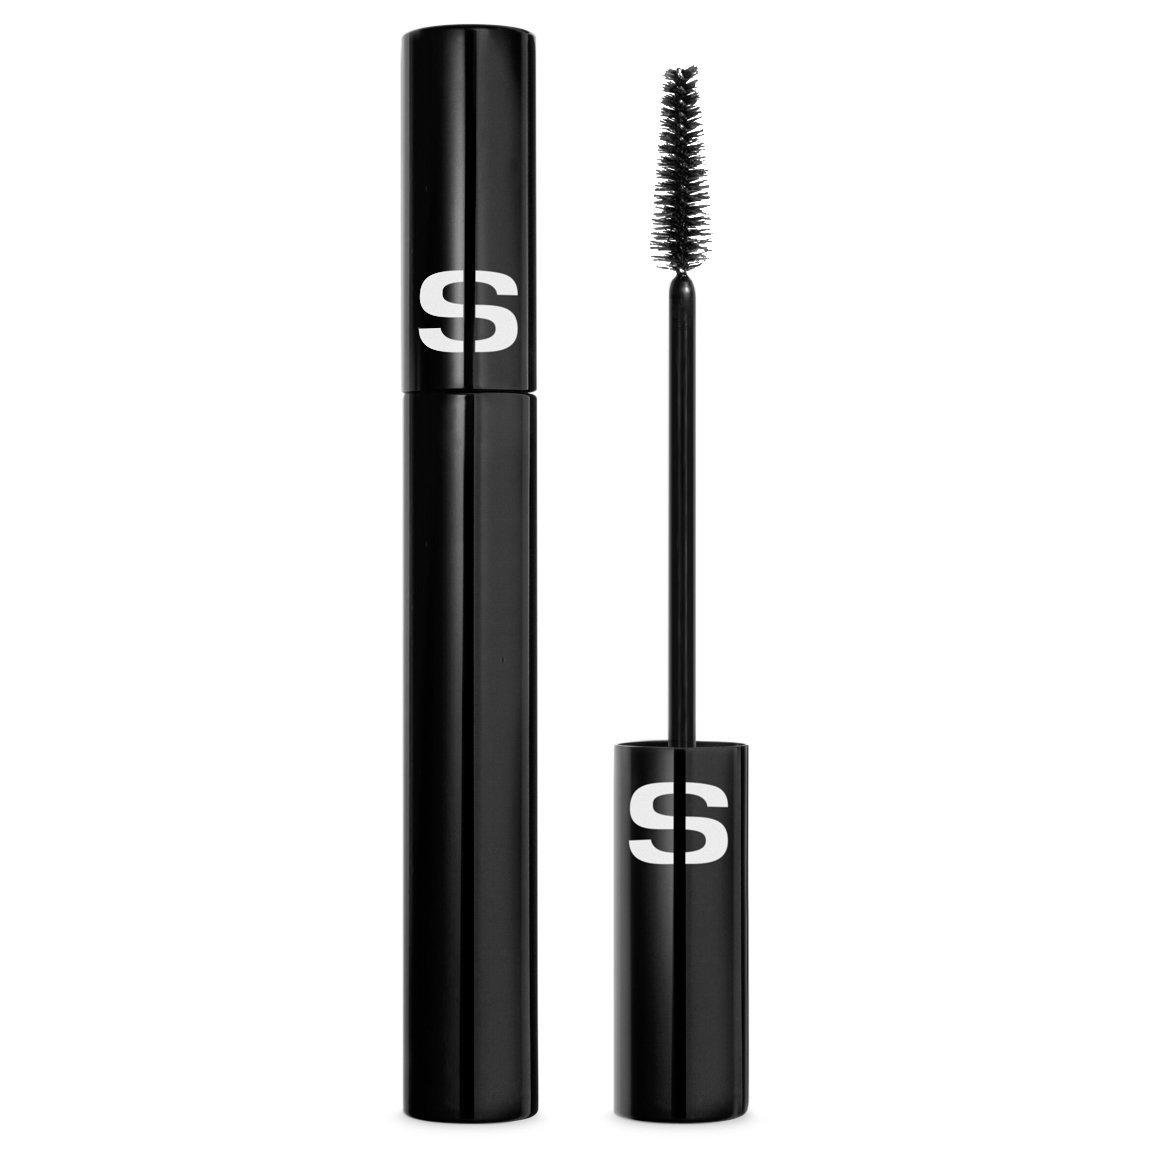 Sisley-Paris Mascara So Stretch 1 Deep Black alternative view 1.